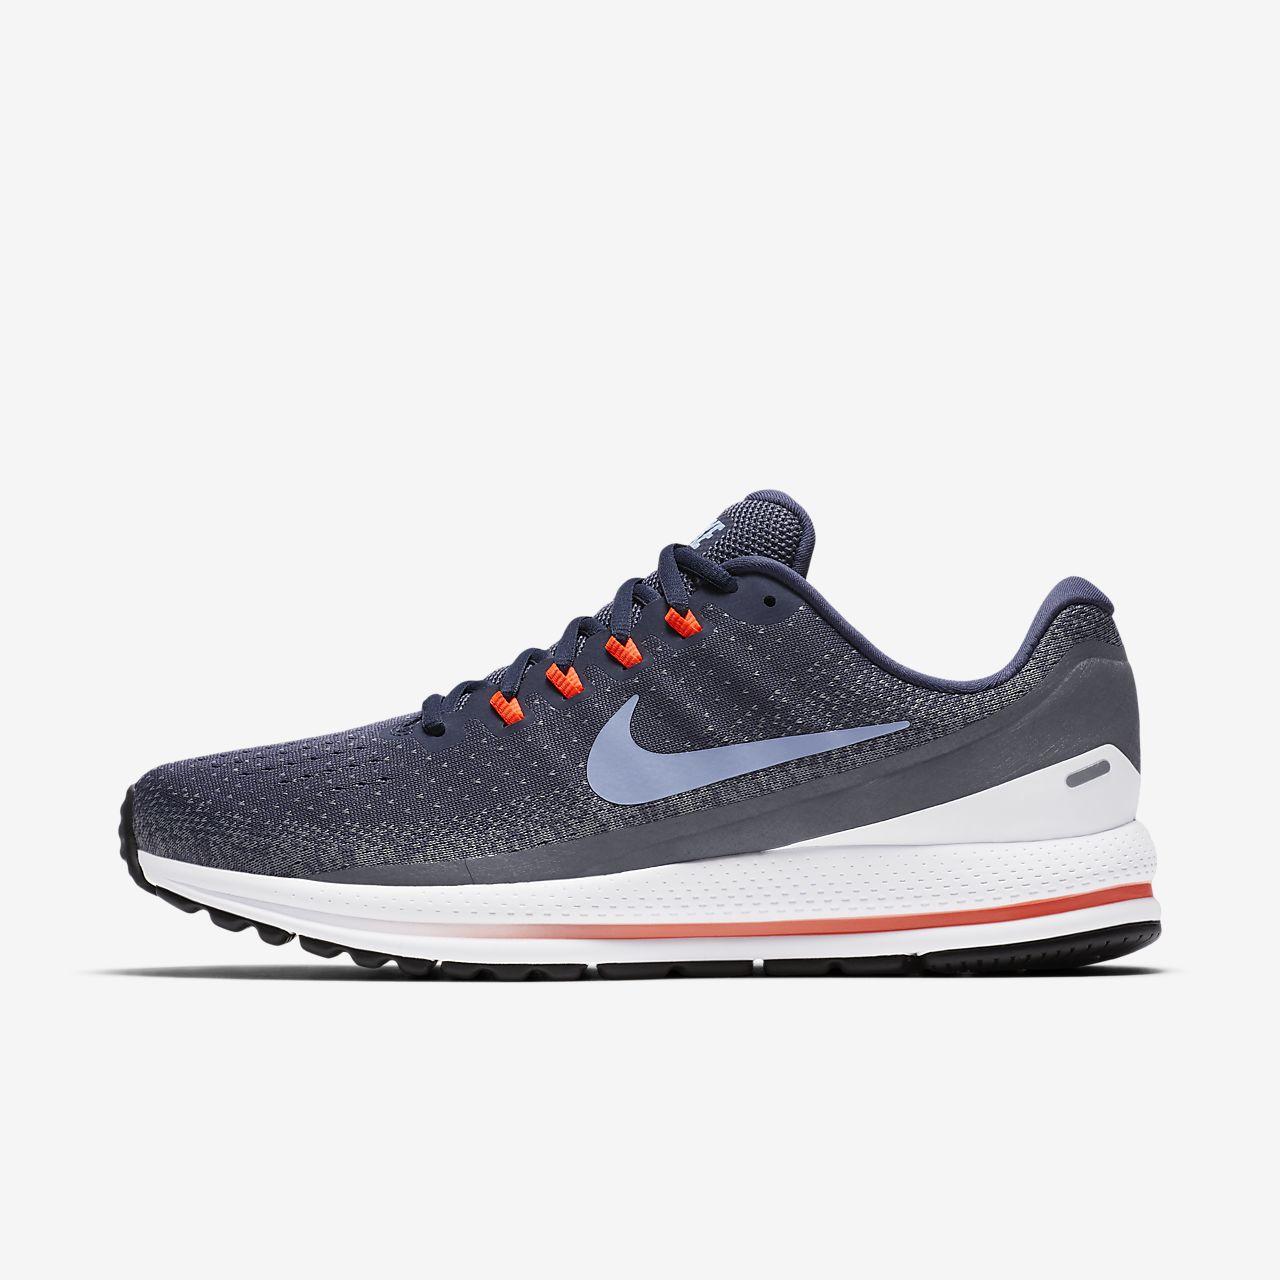 Nike Air Zoom Vomero 13 Manchester Salida De Gran Venta Salida Amplia Gama De wfOwtbTqP9